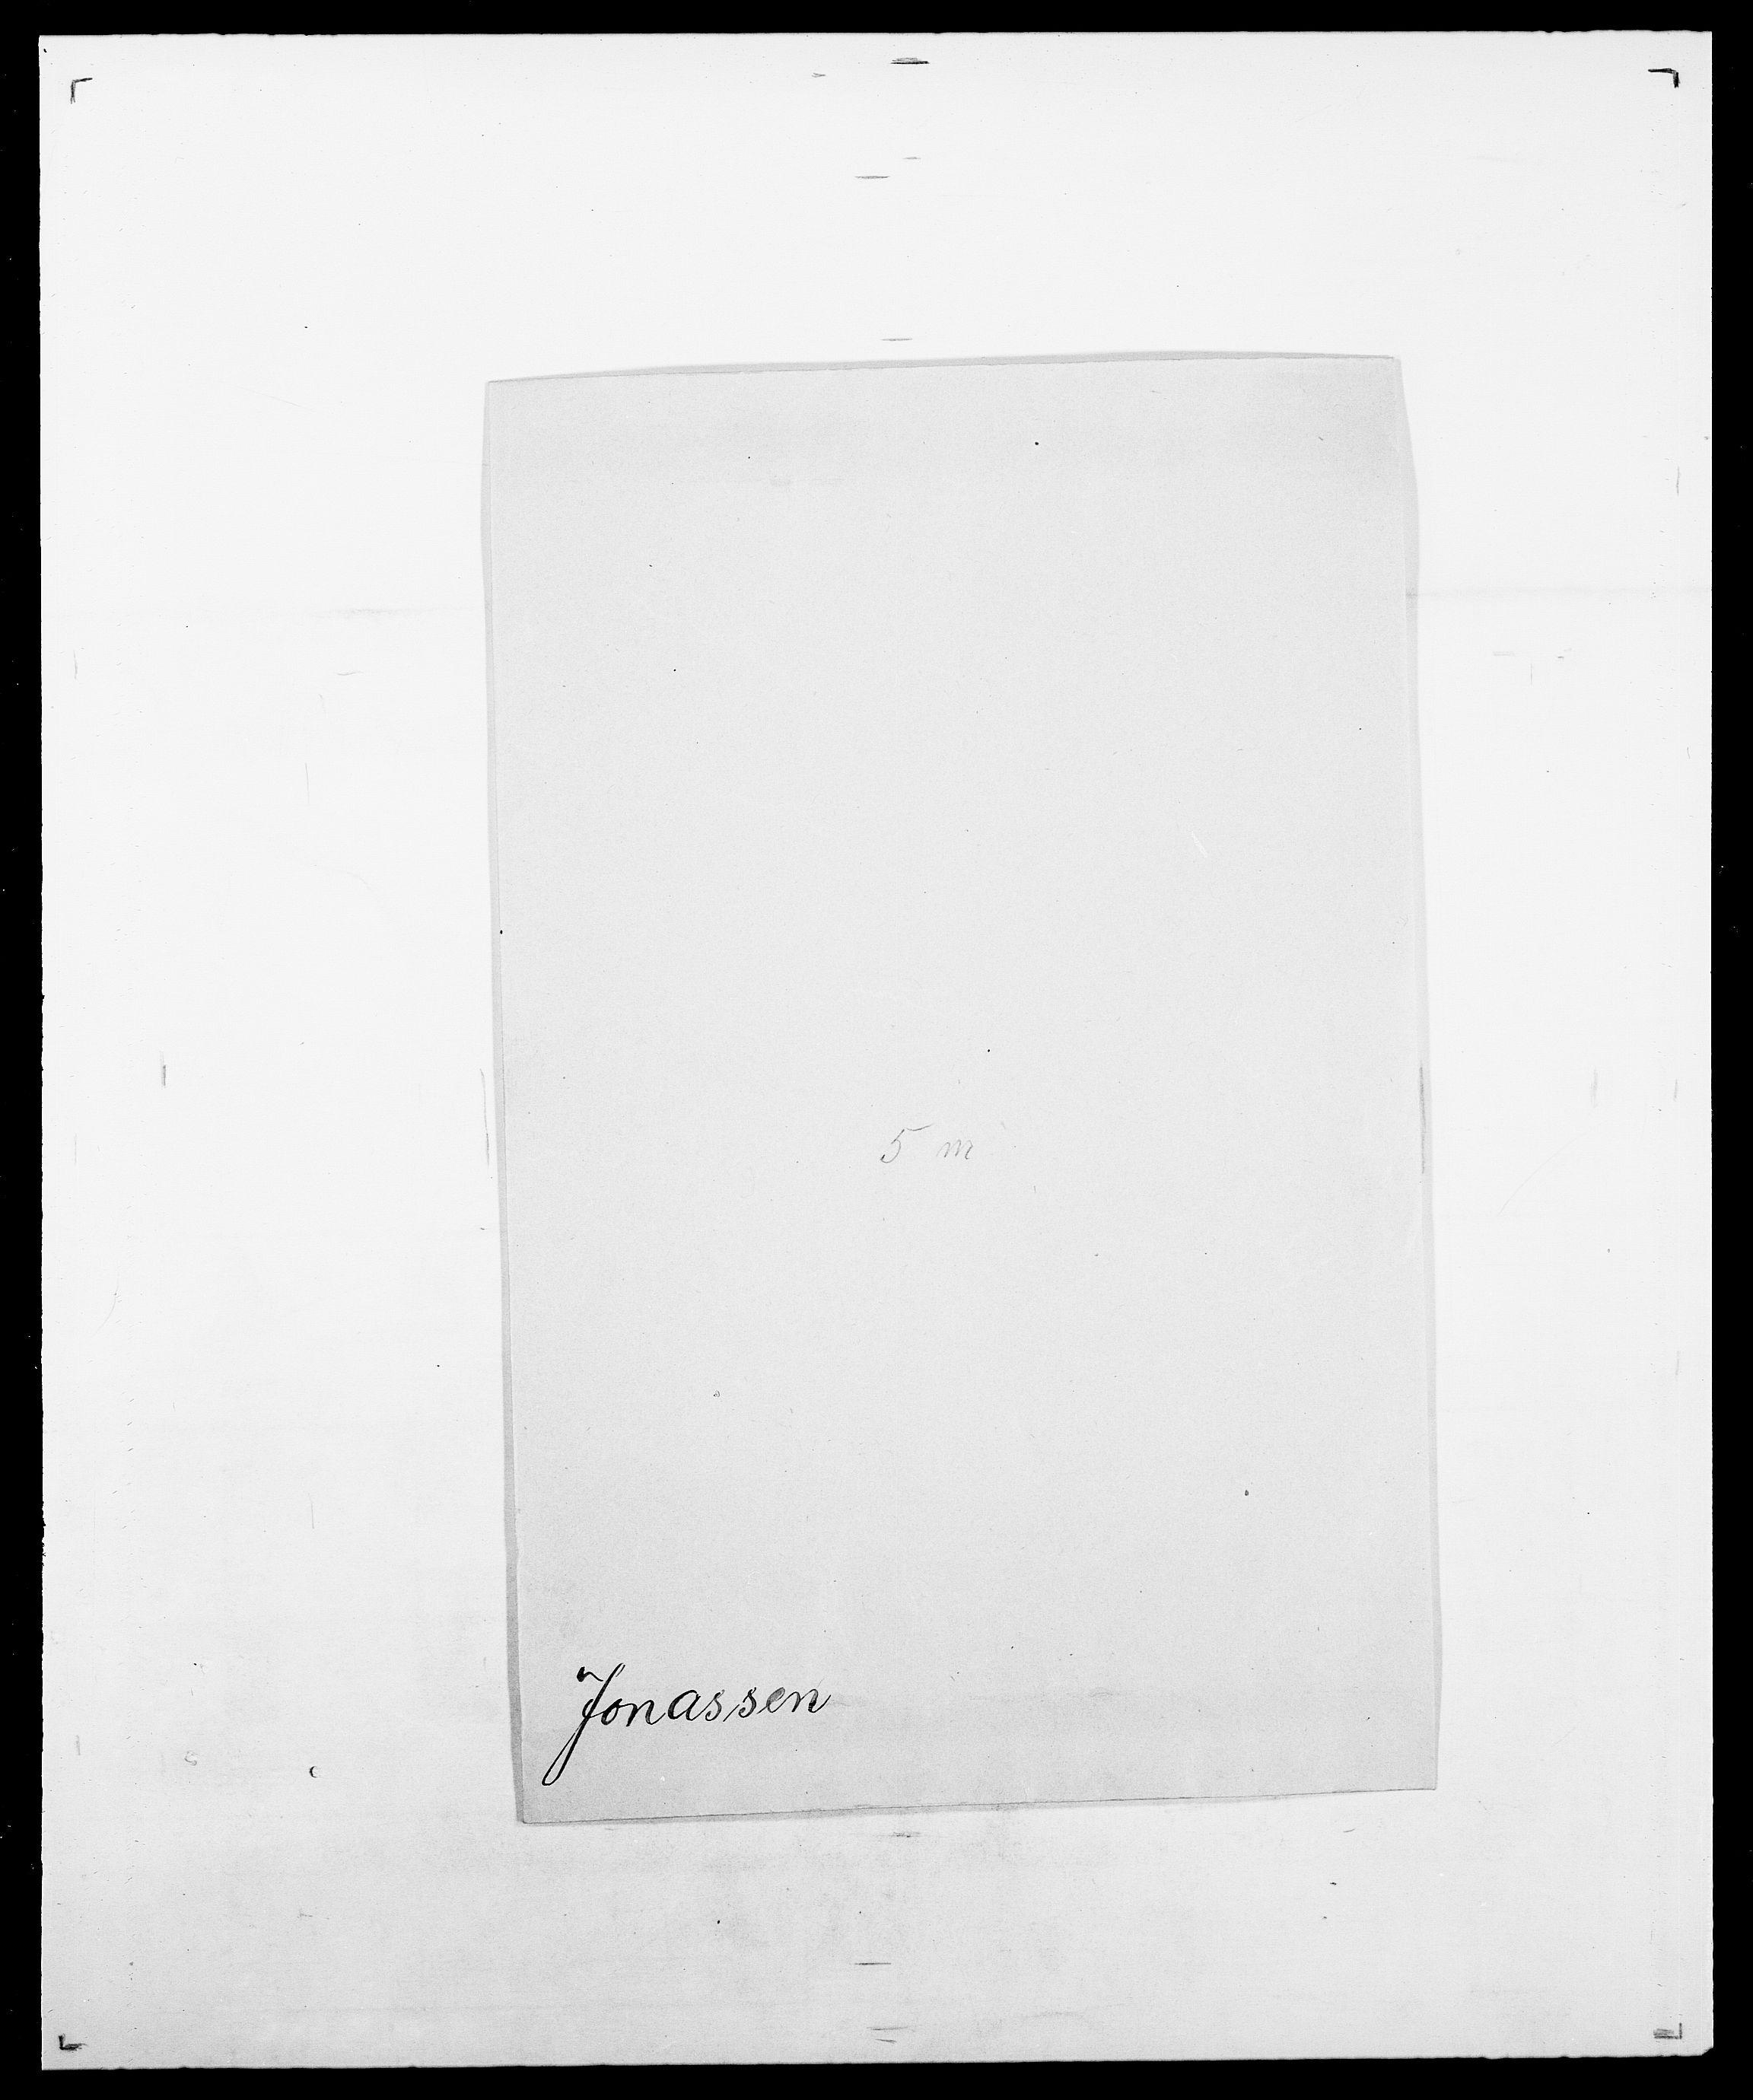 SAO, Delgobe, Charles Antoine - samling, D/Da/L0019: van der Hude - Joys, s. 876